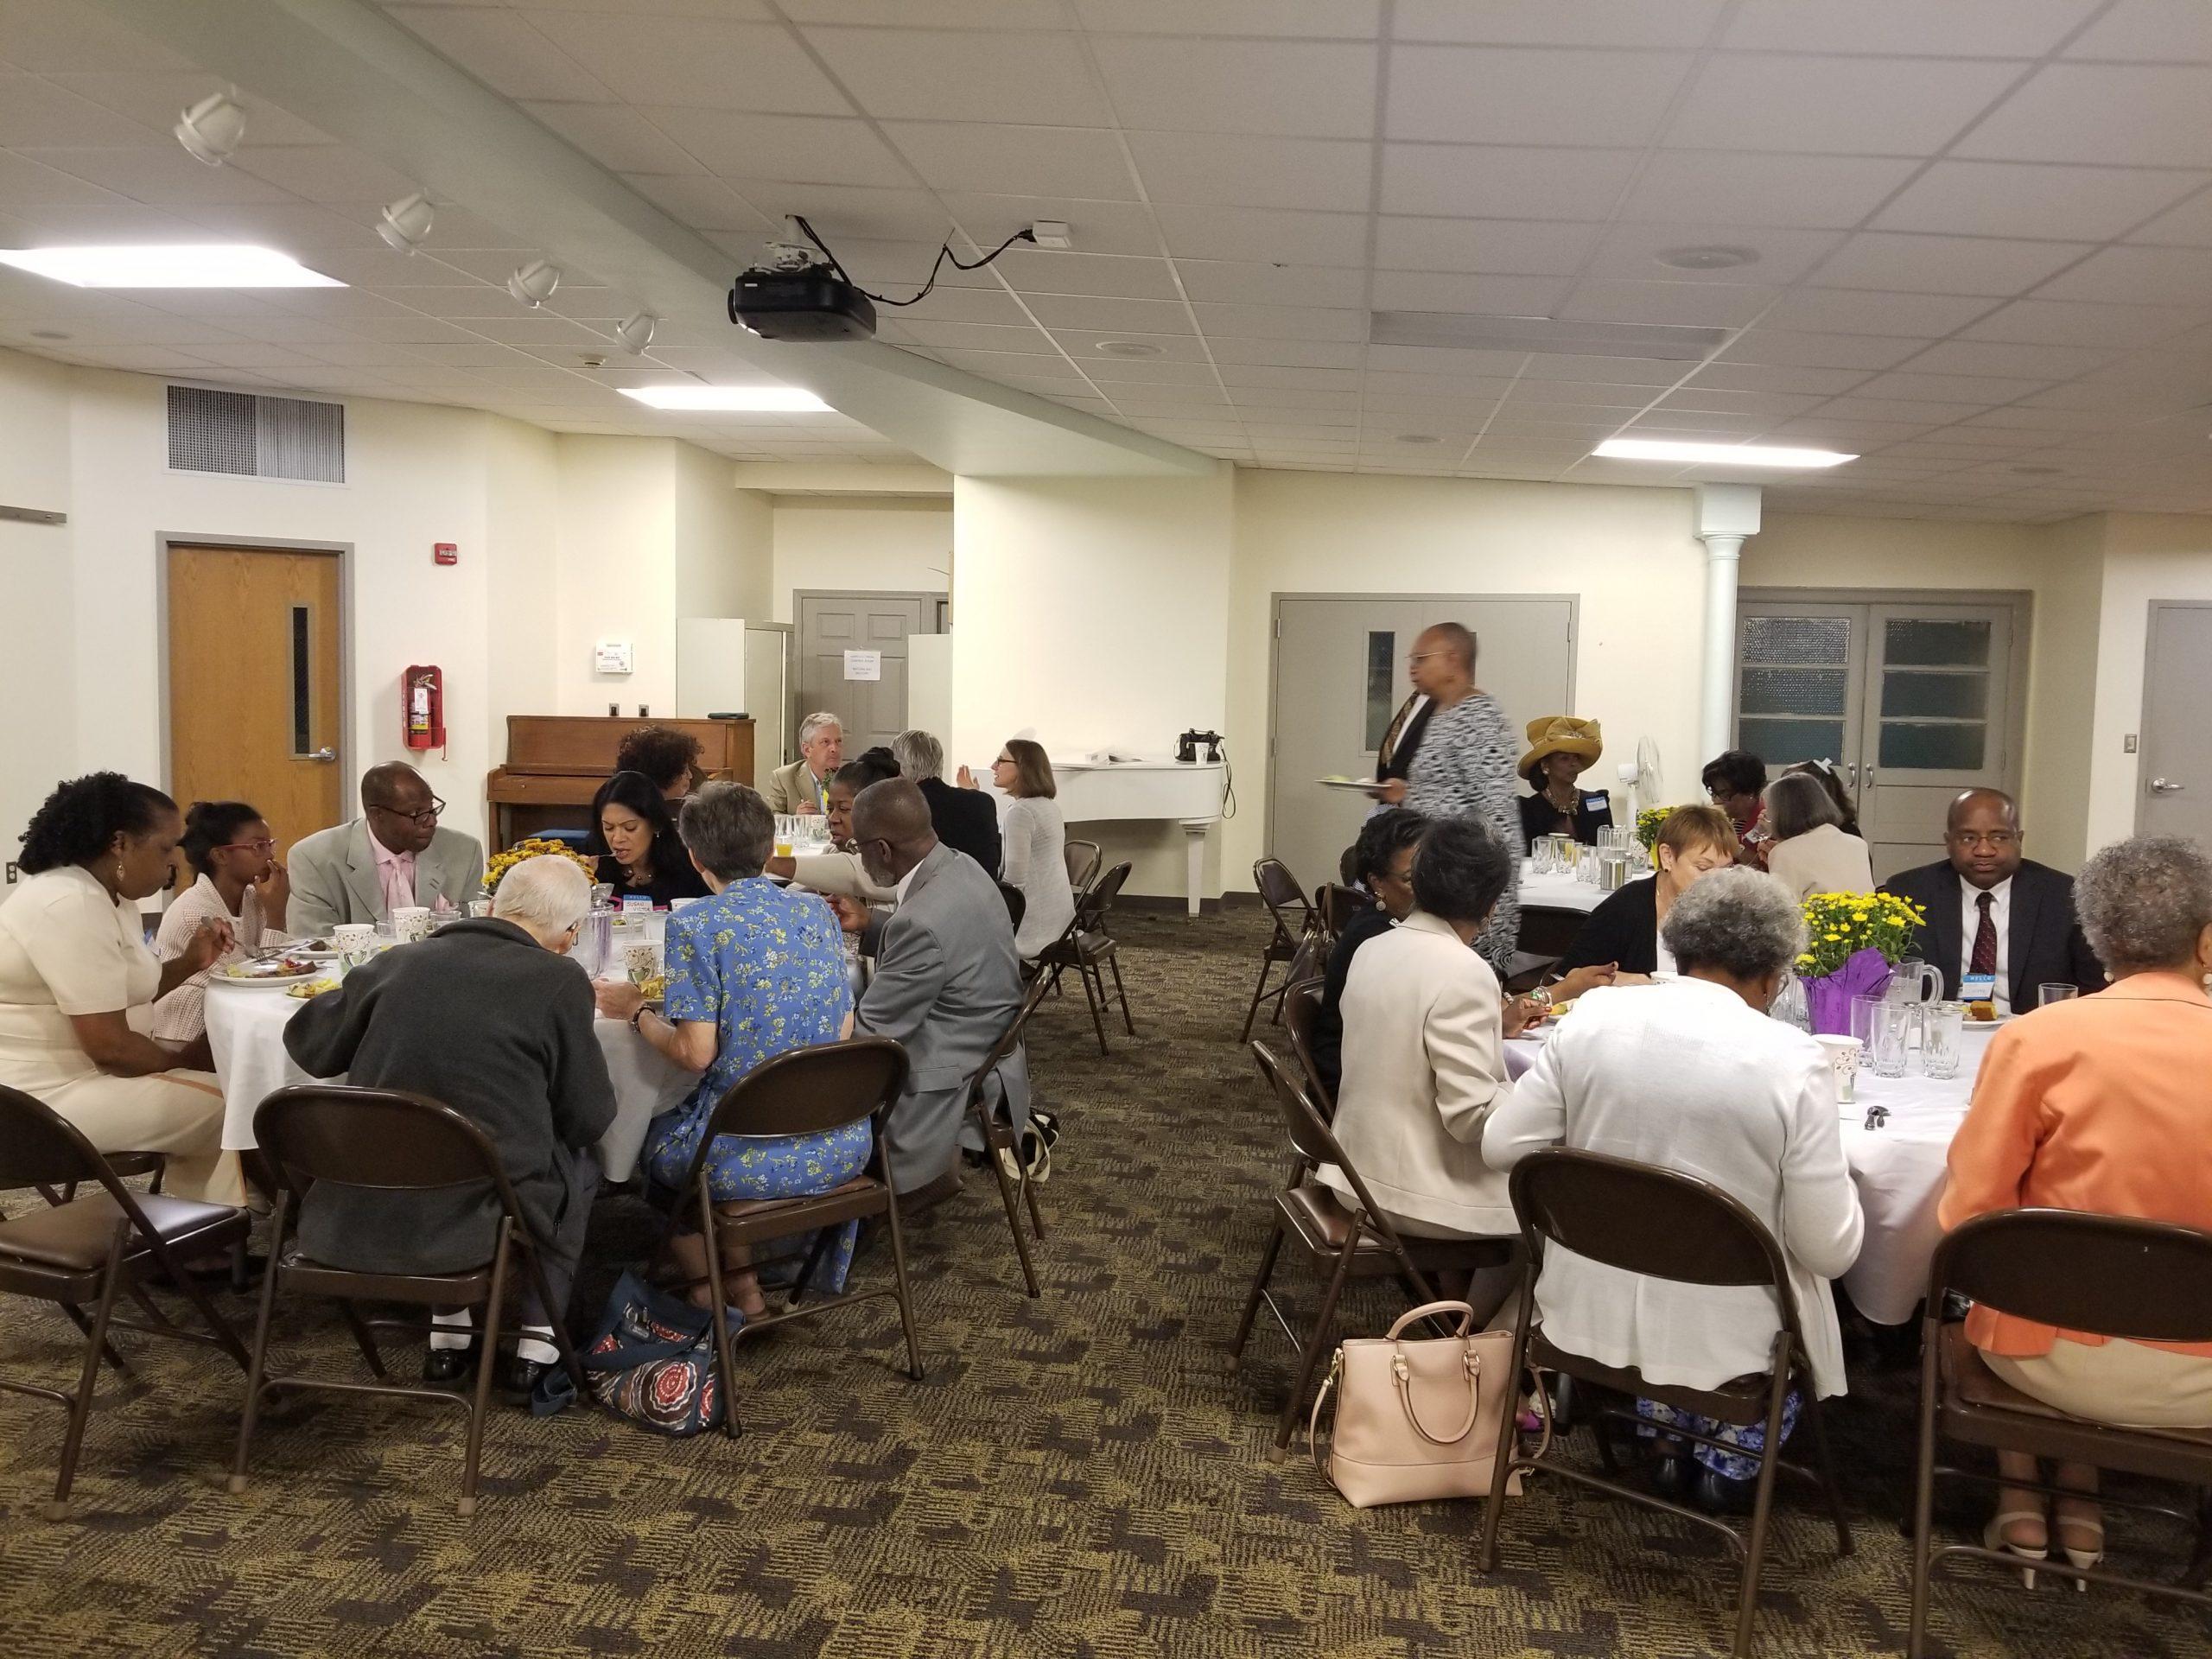 Church breakfast at Princeton United Methodist Church